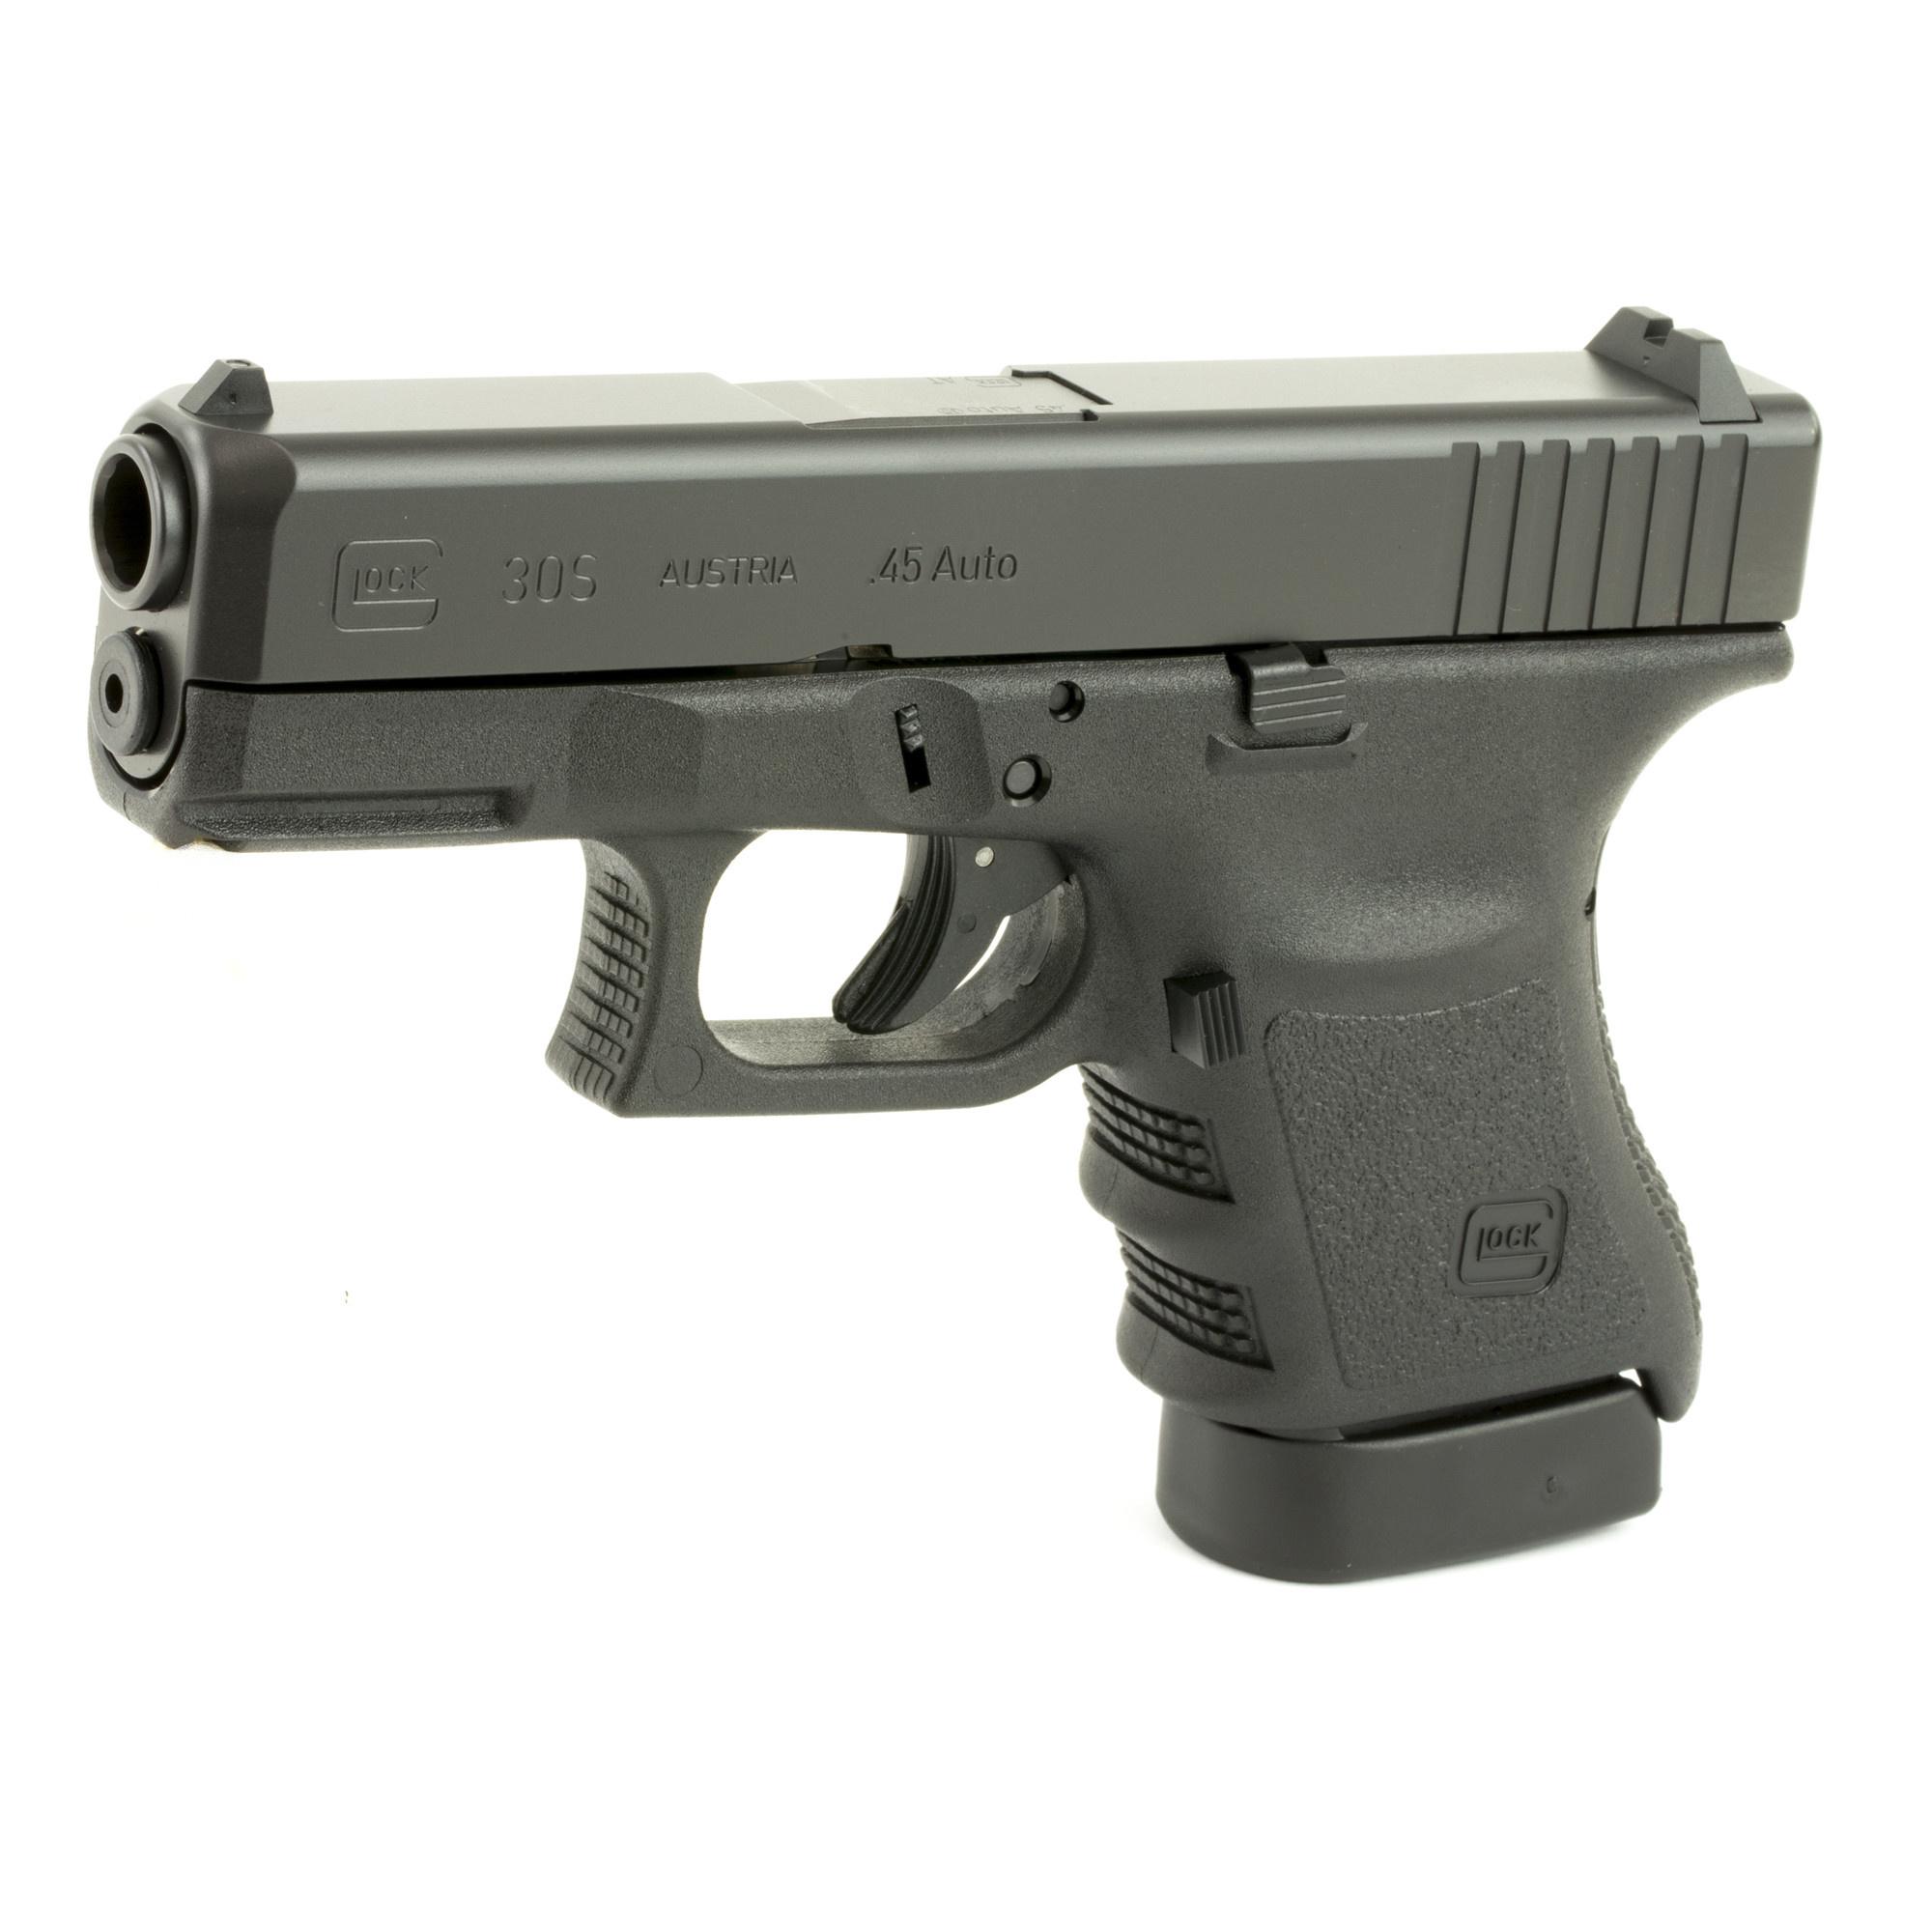 Glock GLOCK G30S 45ACP